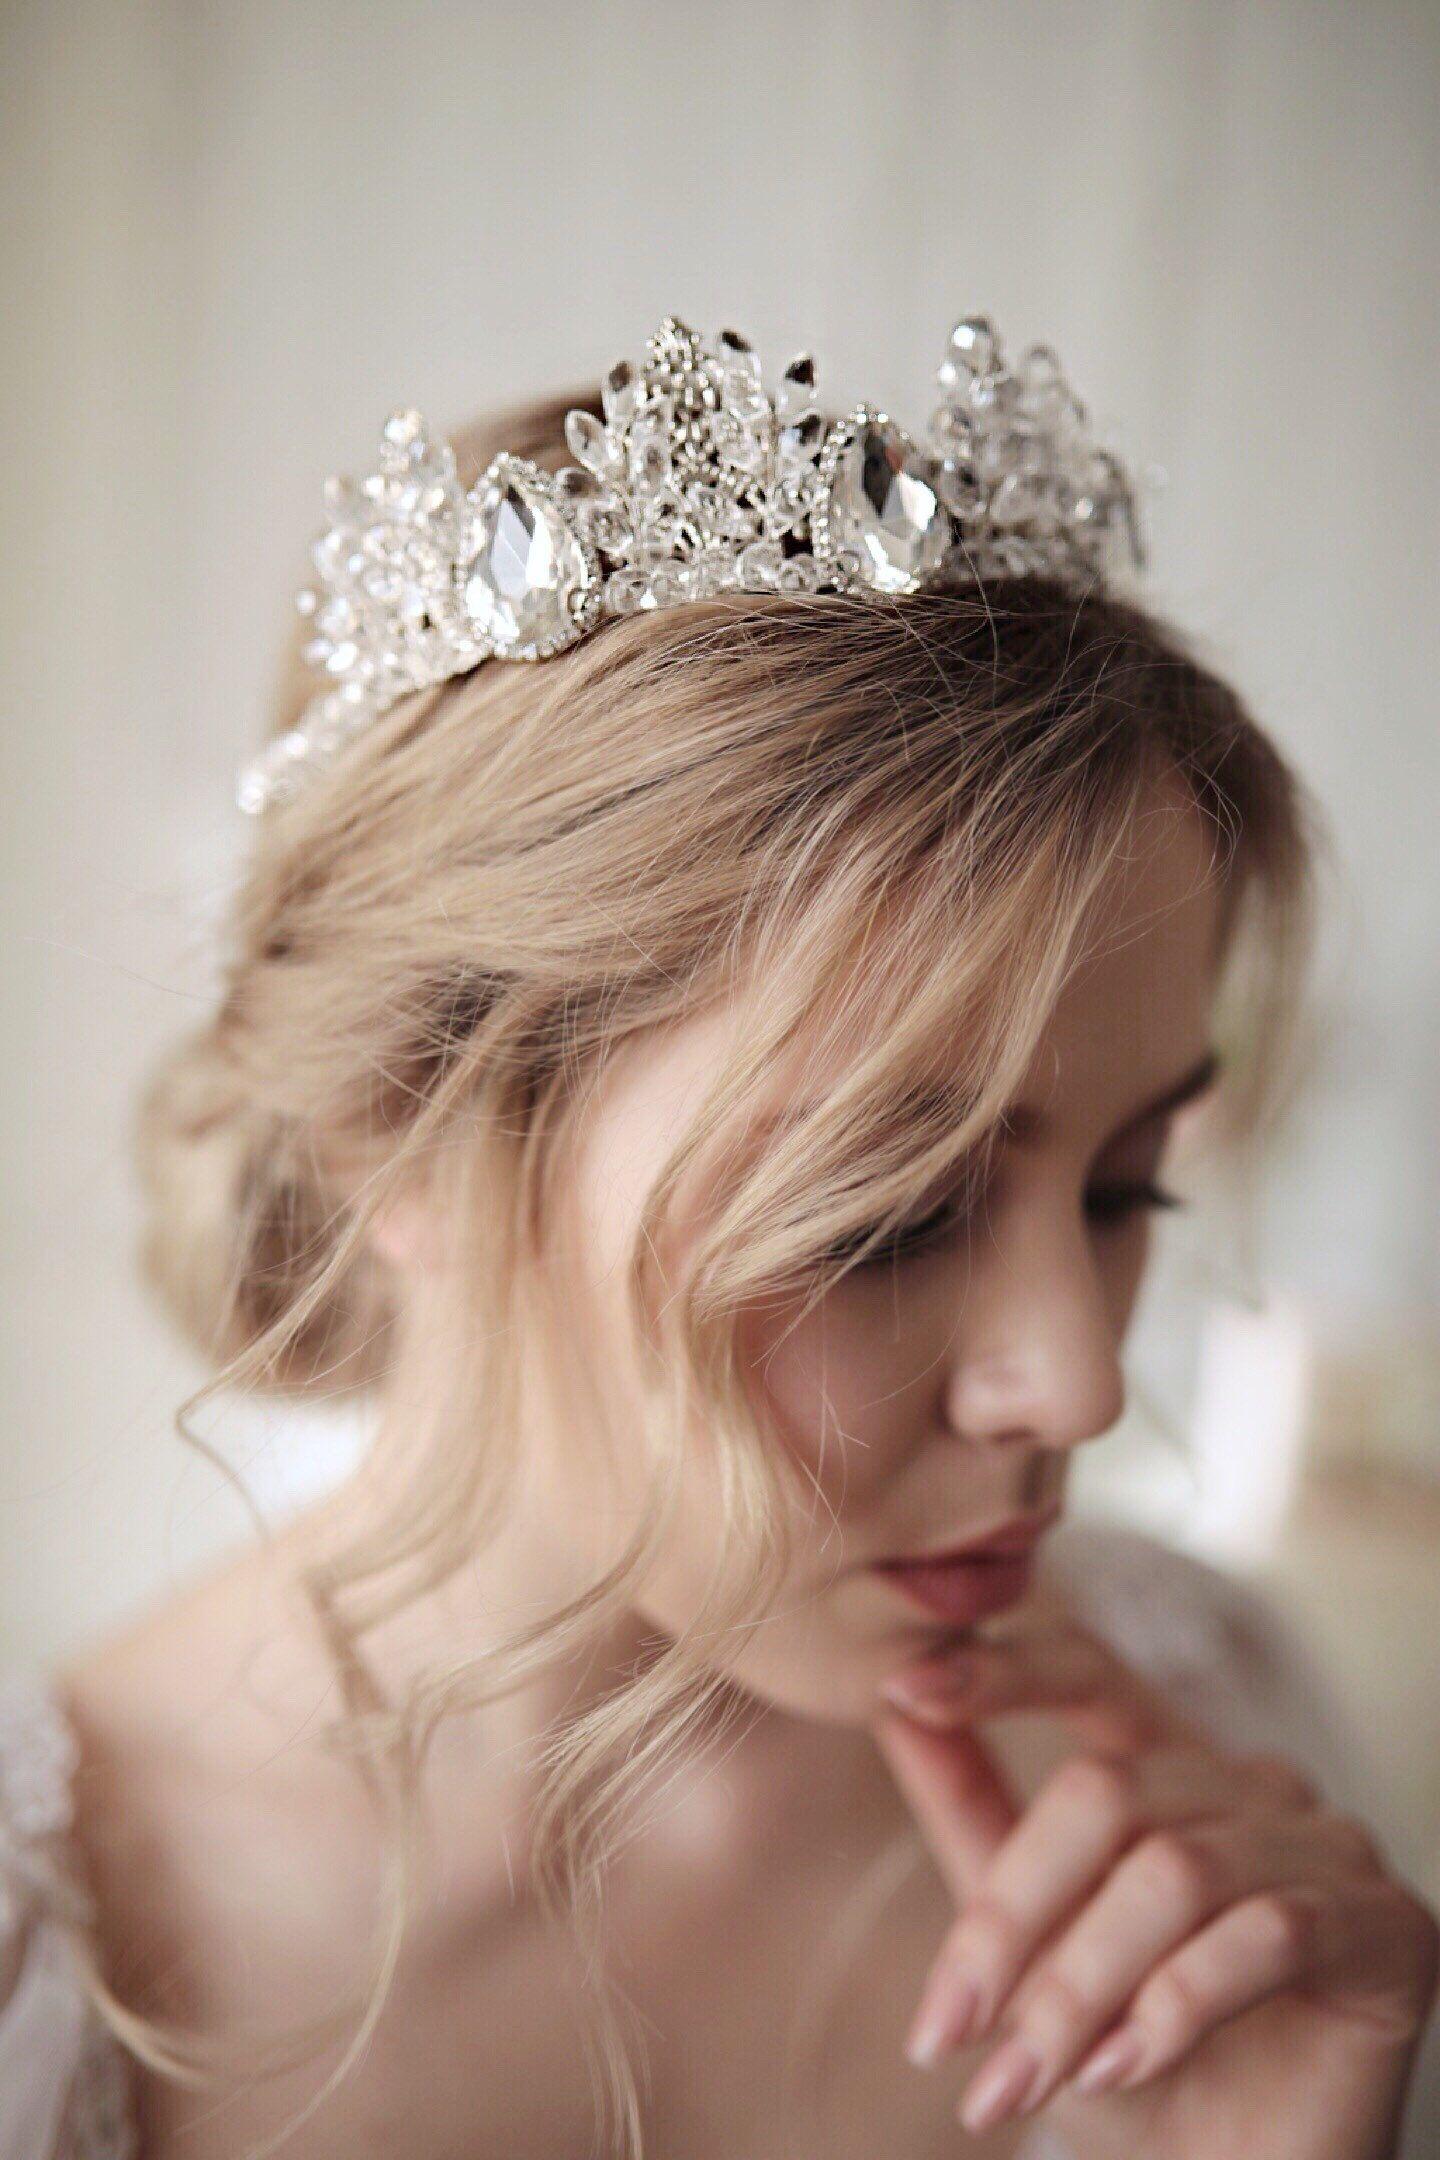 Wedding tiara Silver,wedding crown,Princess crown,Bridal Headpiece,Wedding headband,Queen crown,Tiara Bridal crown,Wedding accessories #bridalheadpieces